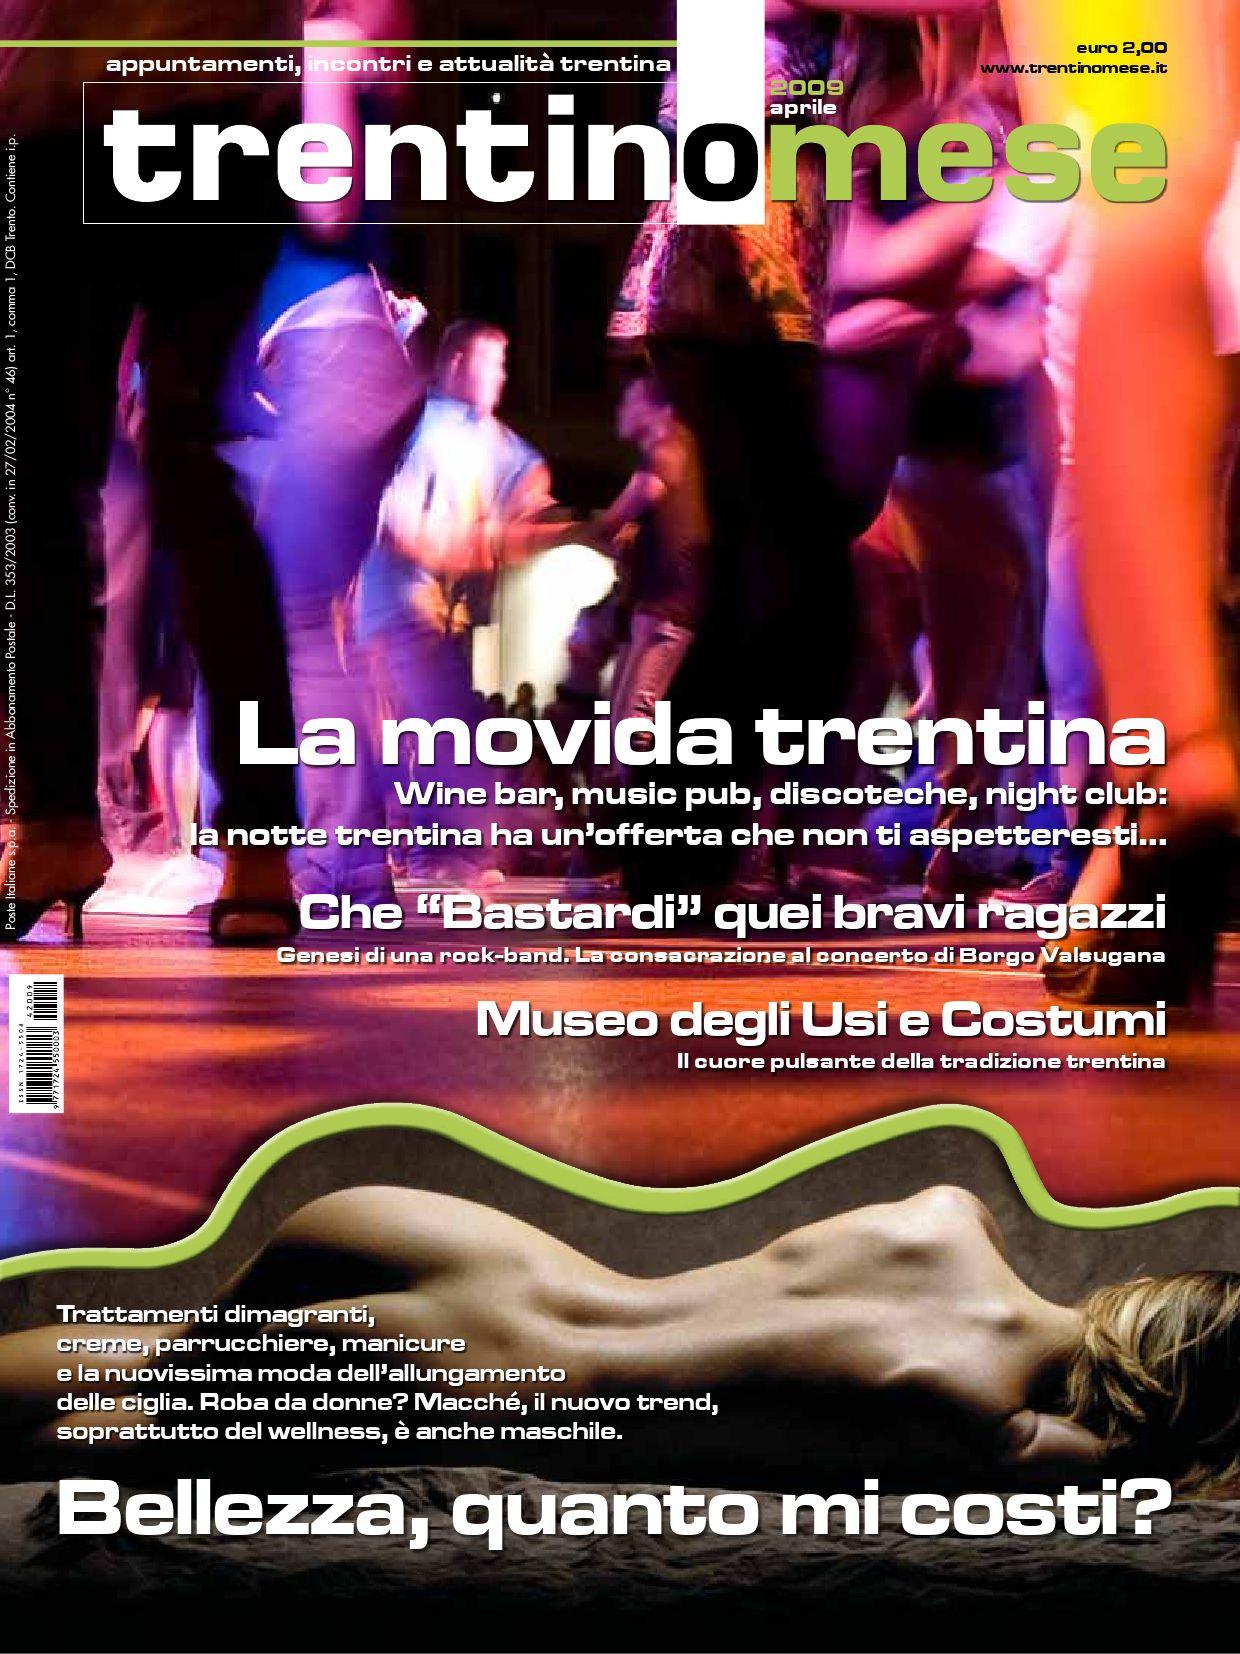 Trentinomese Aprile 09 by Curcu Genovese - issuu d47721088